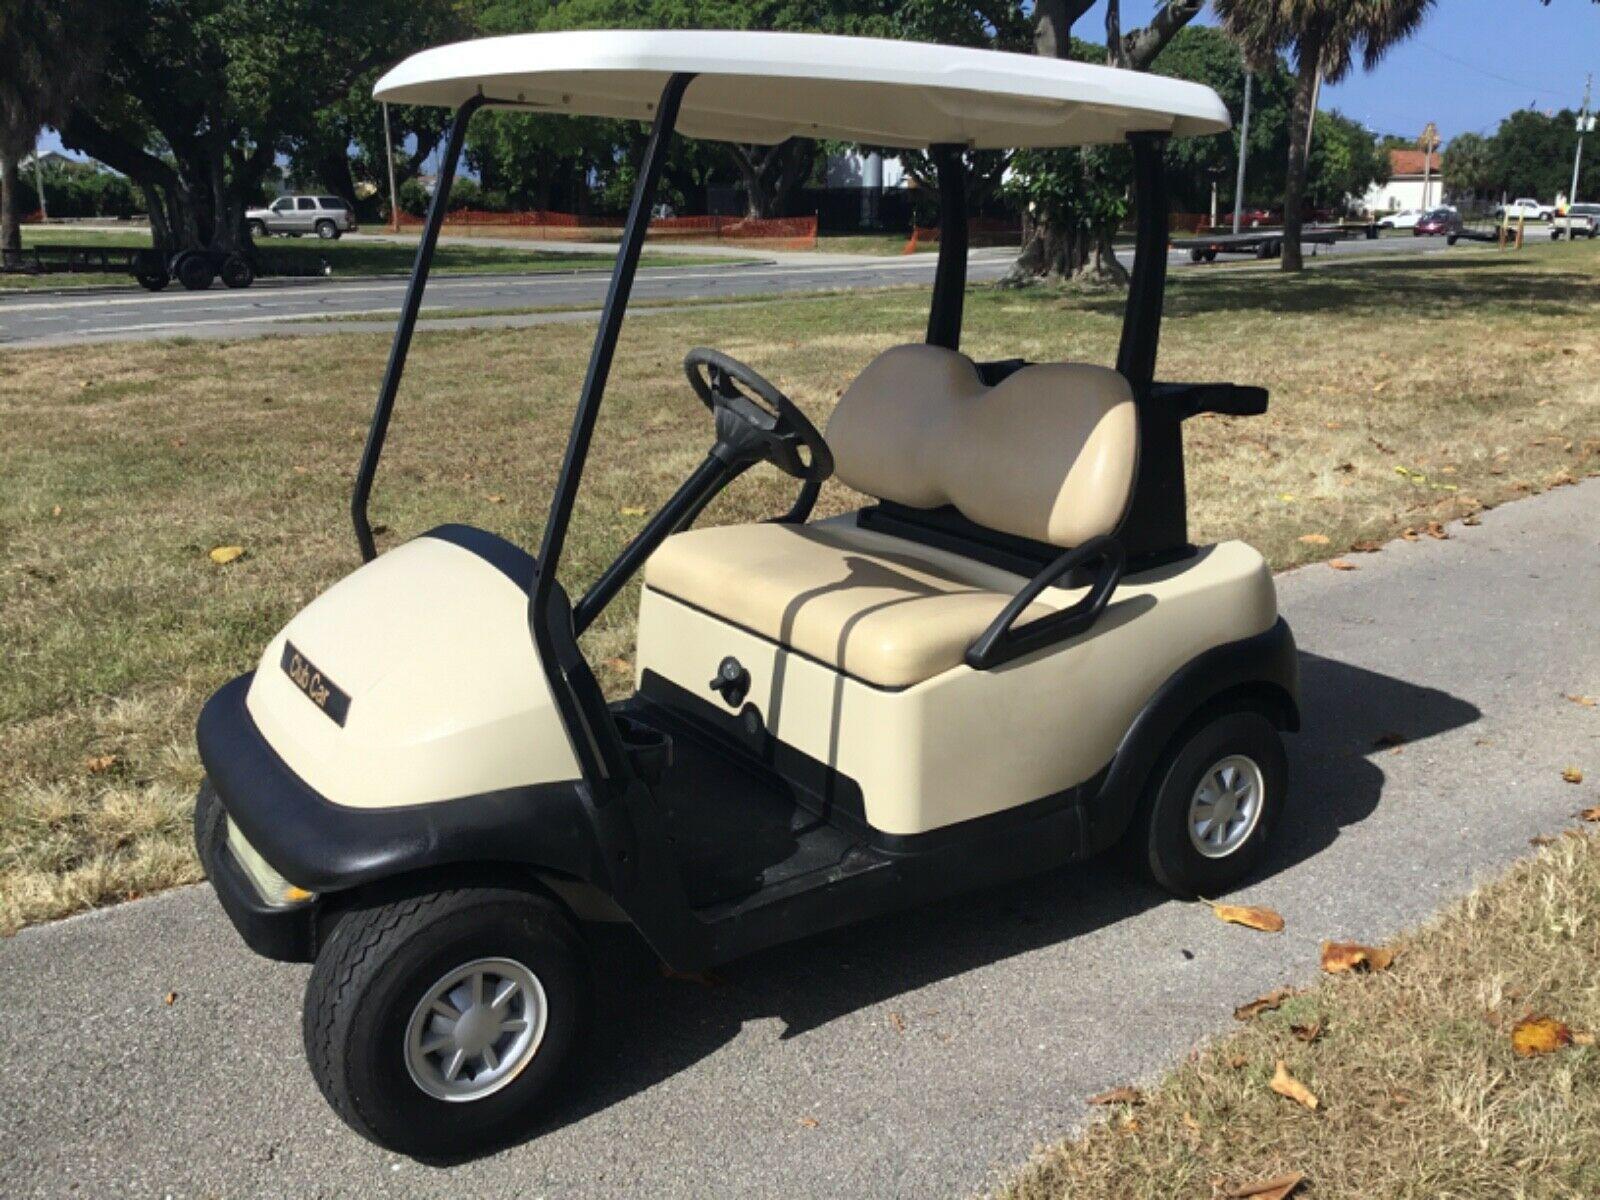 Club Car 2007 Custom Club Car Precedent Gas Tan Golf Cart 2 Passenger Seat W Canopy Lites Runs Good In 2020 Golf Carts For Sale Electric Golf Cart Yamaha Golf Carts